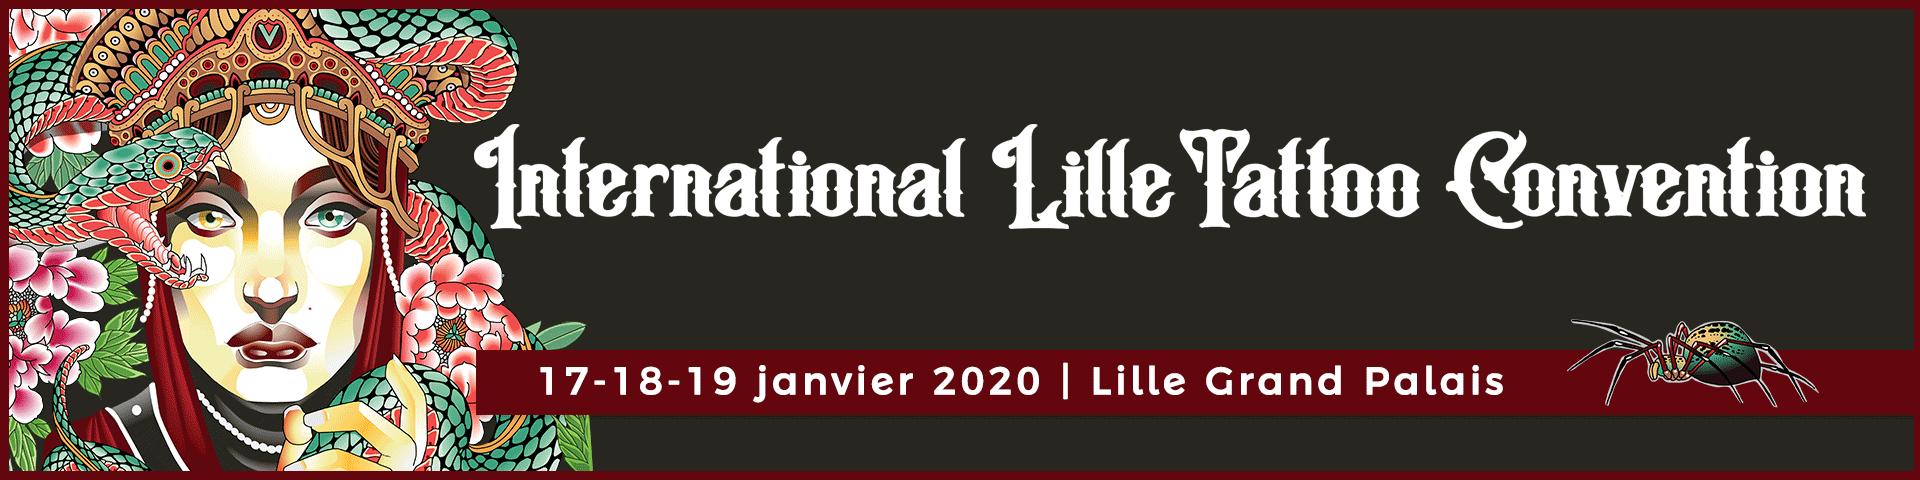 exposants-createurs-2020-International-Lille-Tattoo-convention-France-2020